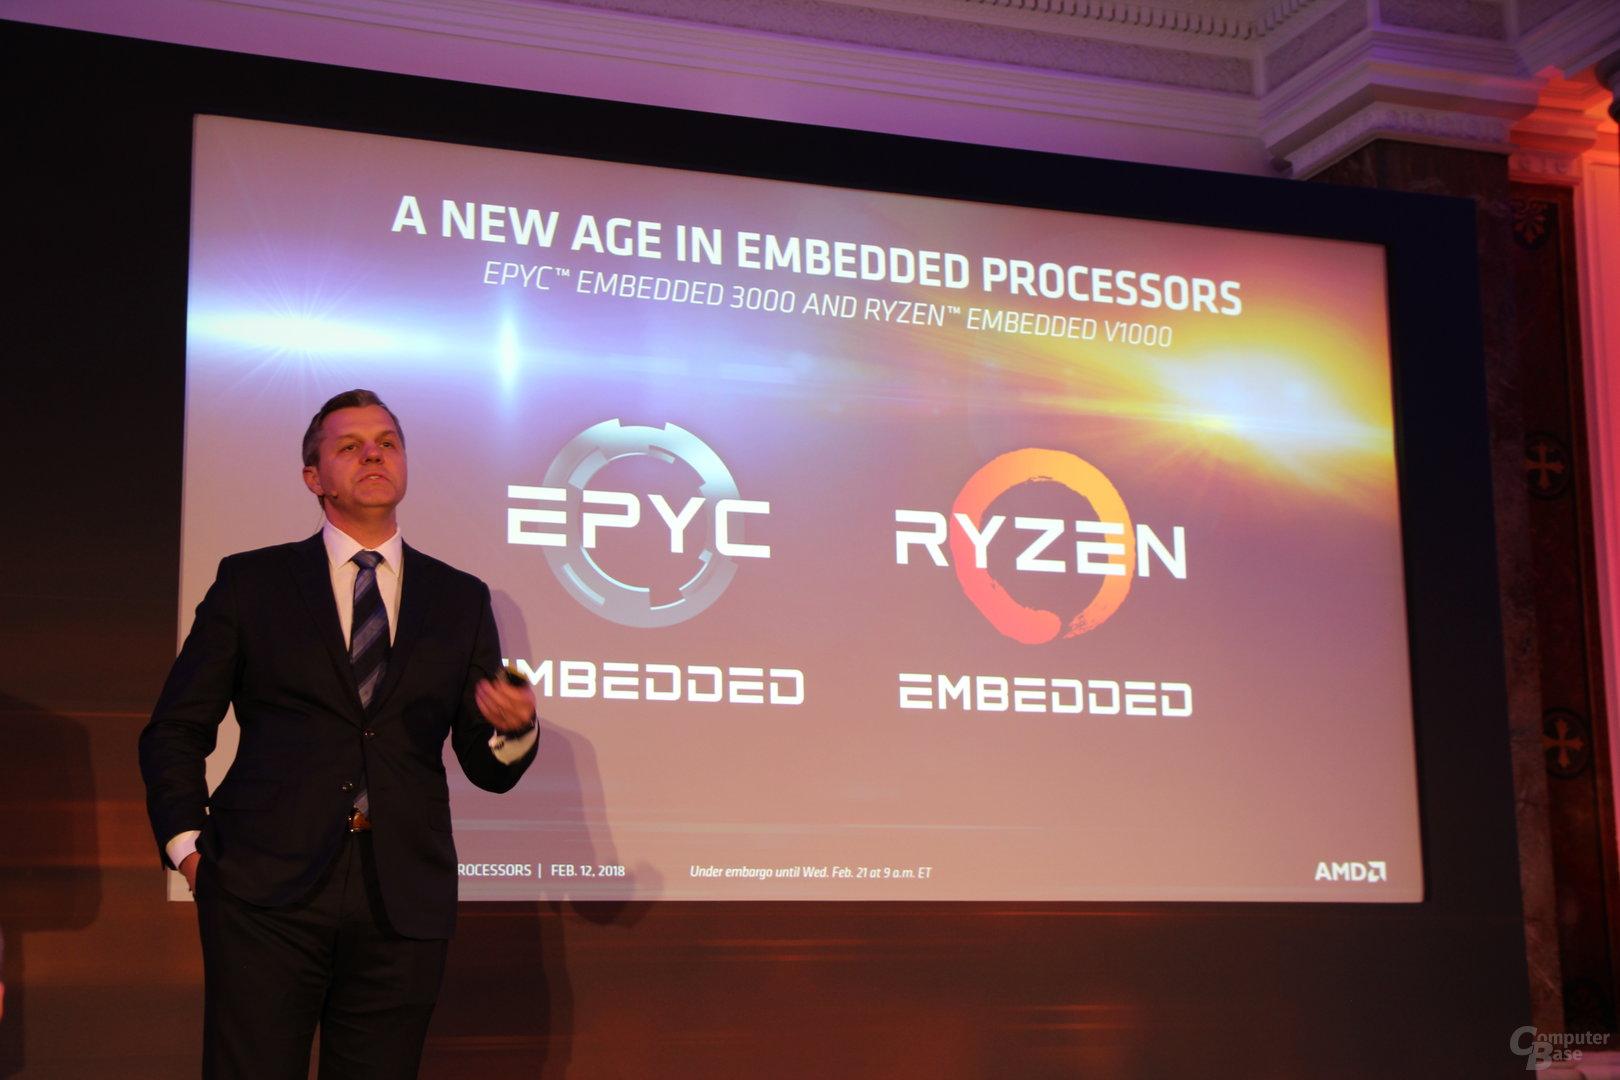 AMD Intros EPYC 3000 Series Embedded Processors - 2 7x